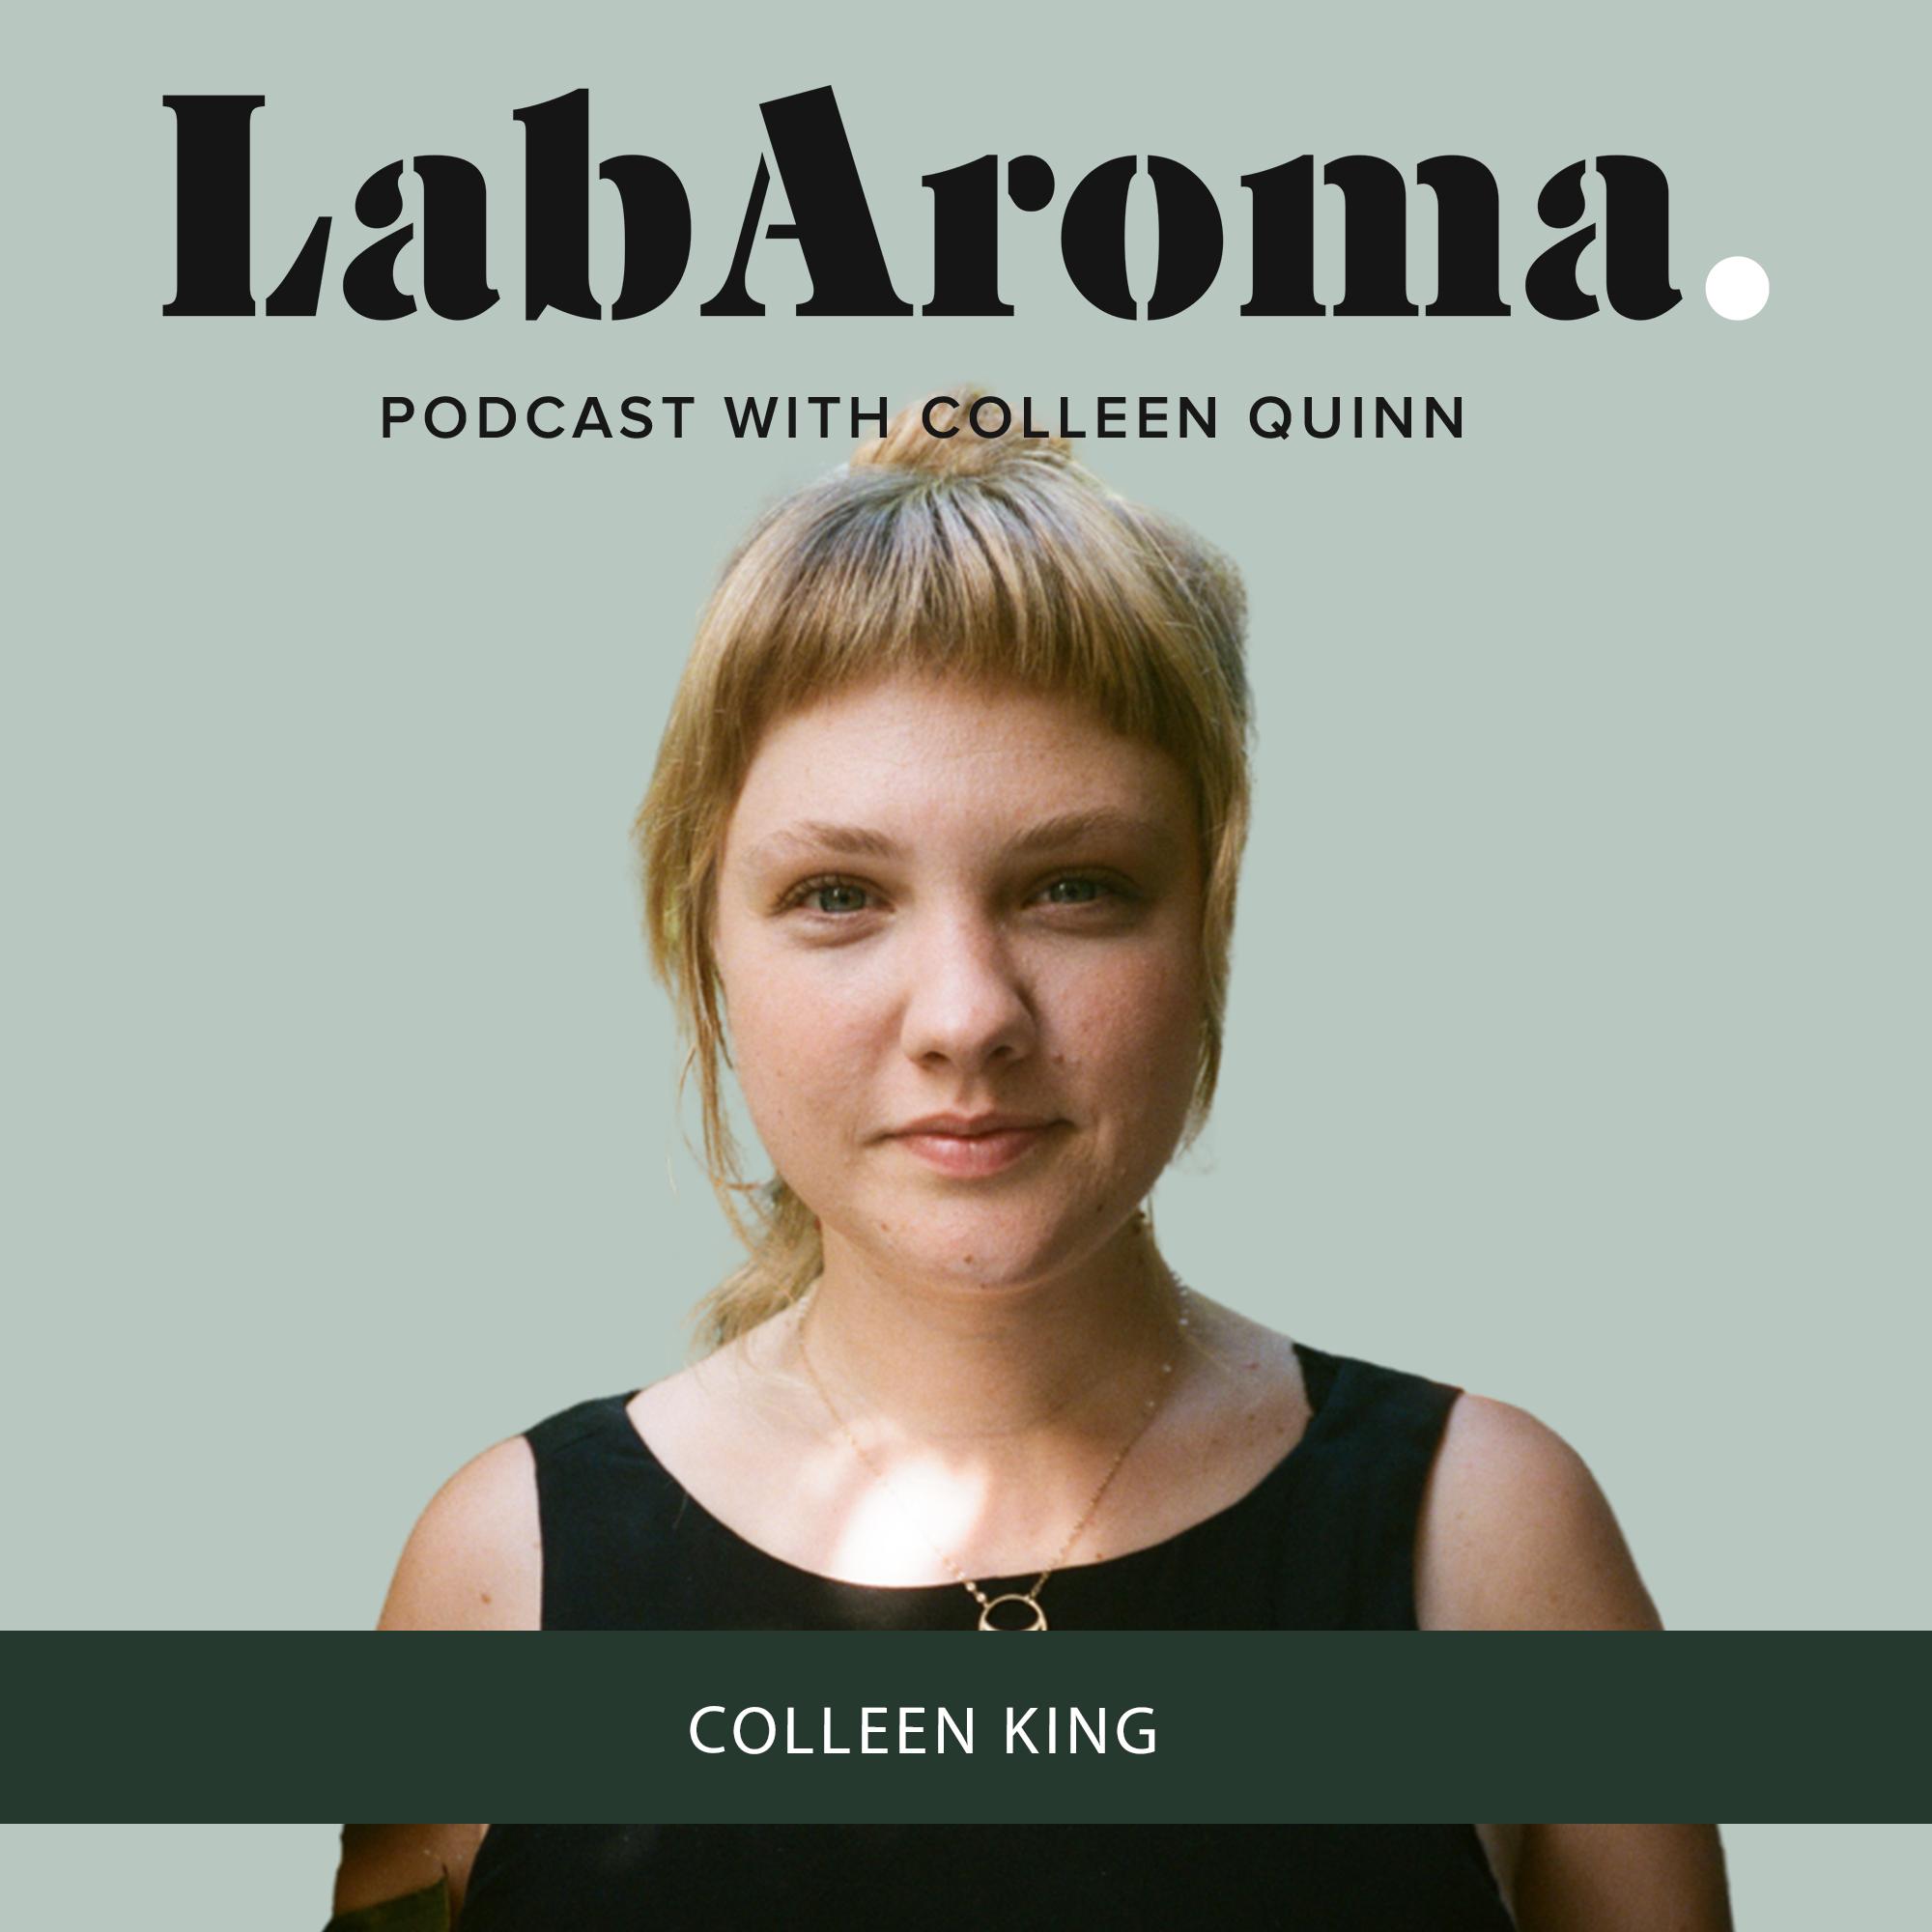 Colleen King